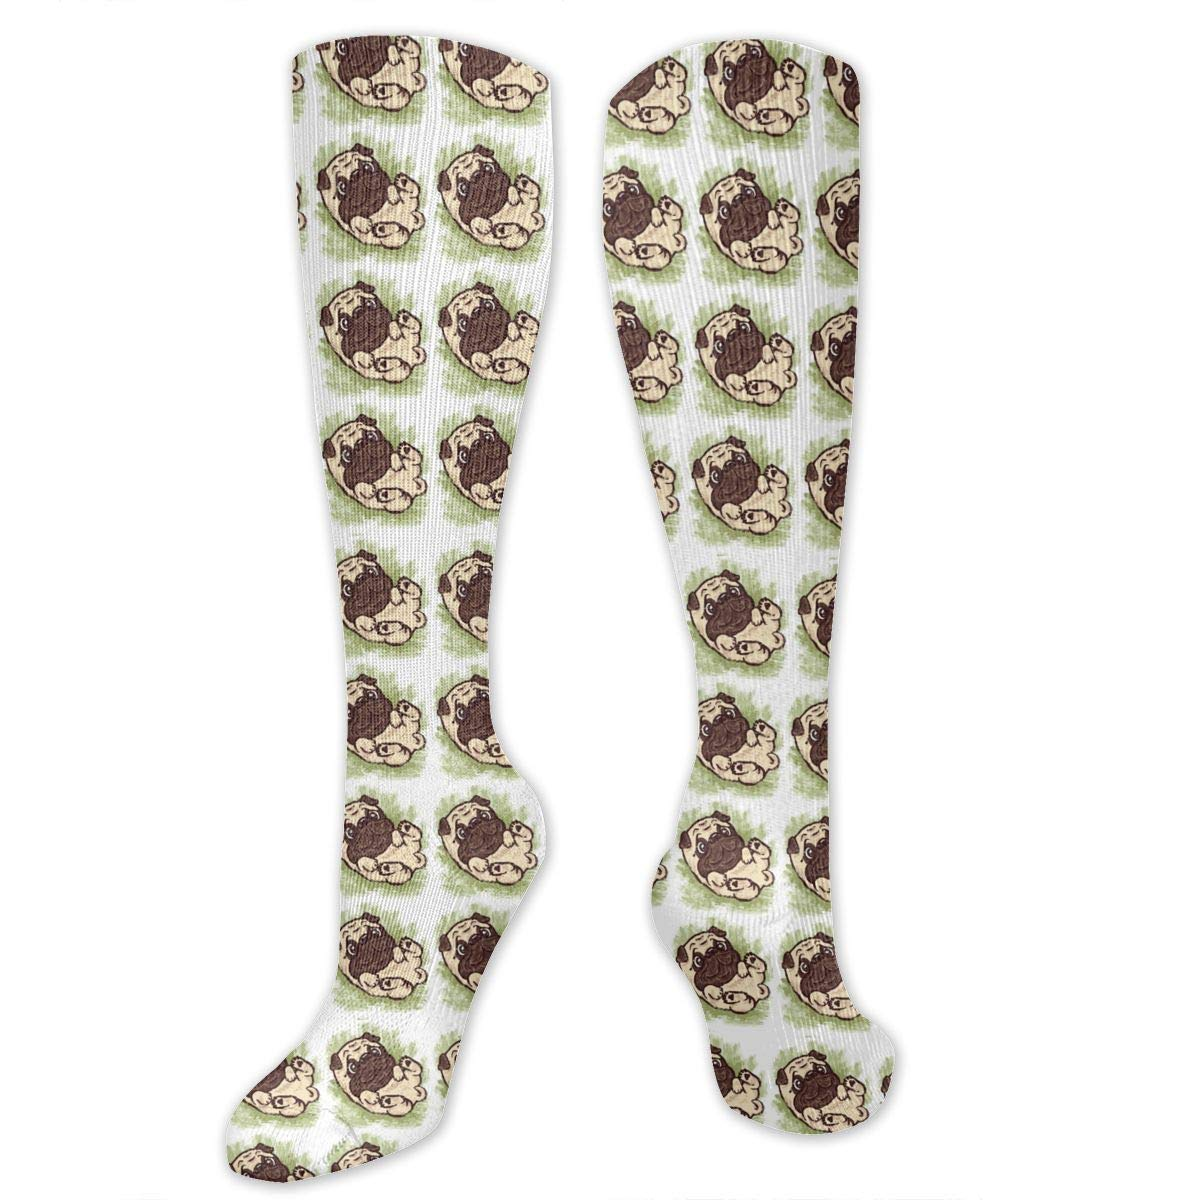 Amazon.com  Cute Pug Pattern Women s Flat Knit Knee Socks Patterned Long  Socks  Clothing 57cfb83672